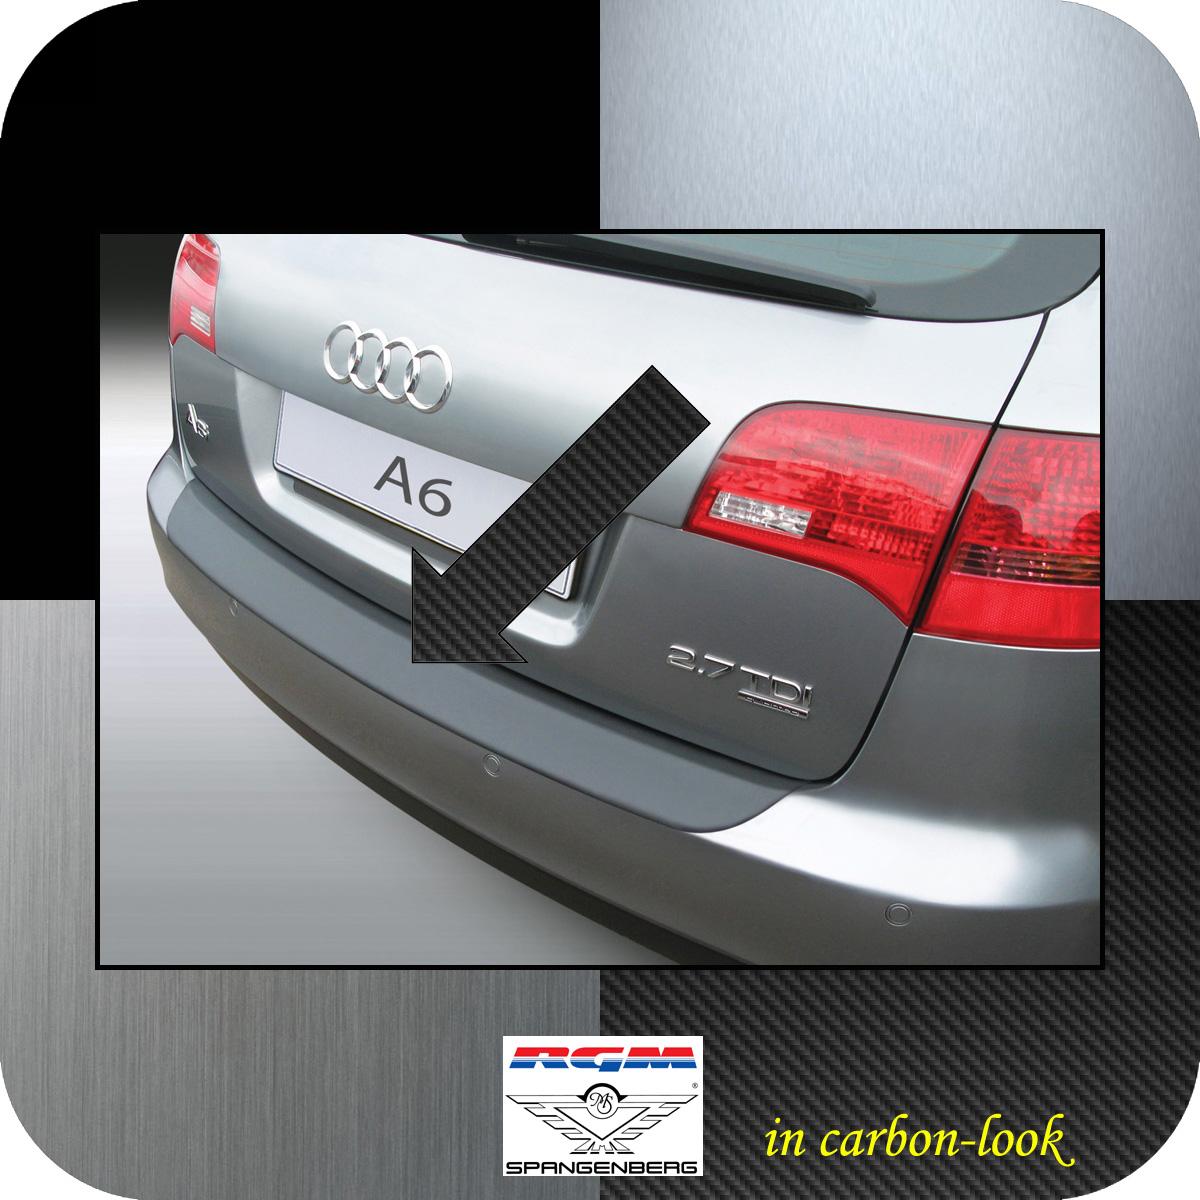 Ladekantenschutz Carbon-Look Audi A6 C6 Avant auch Allroad Kombi 2005-11 3509341